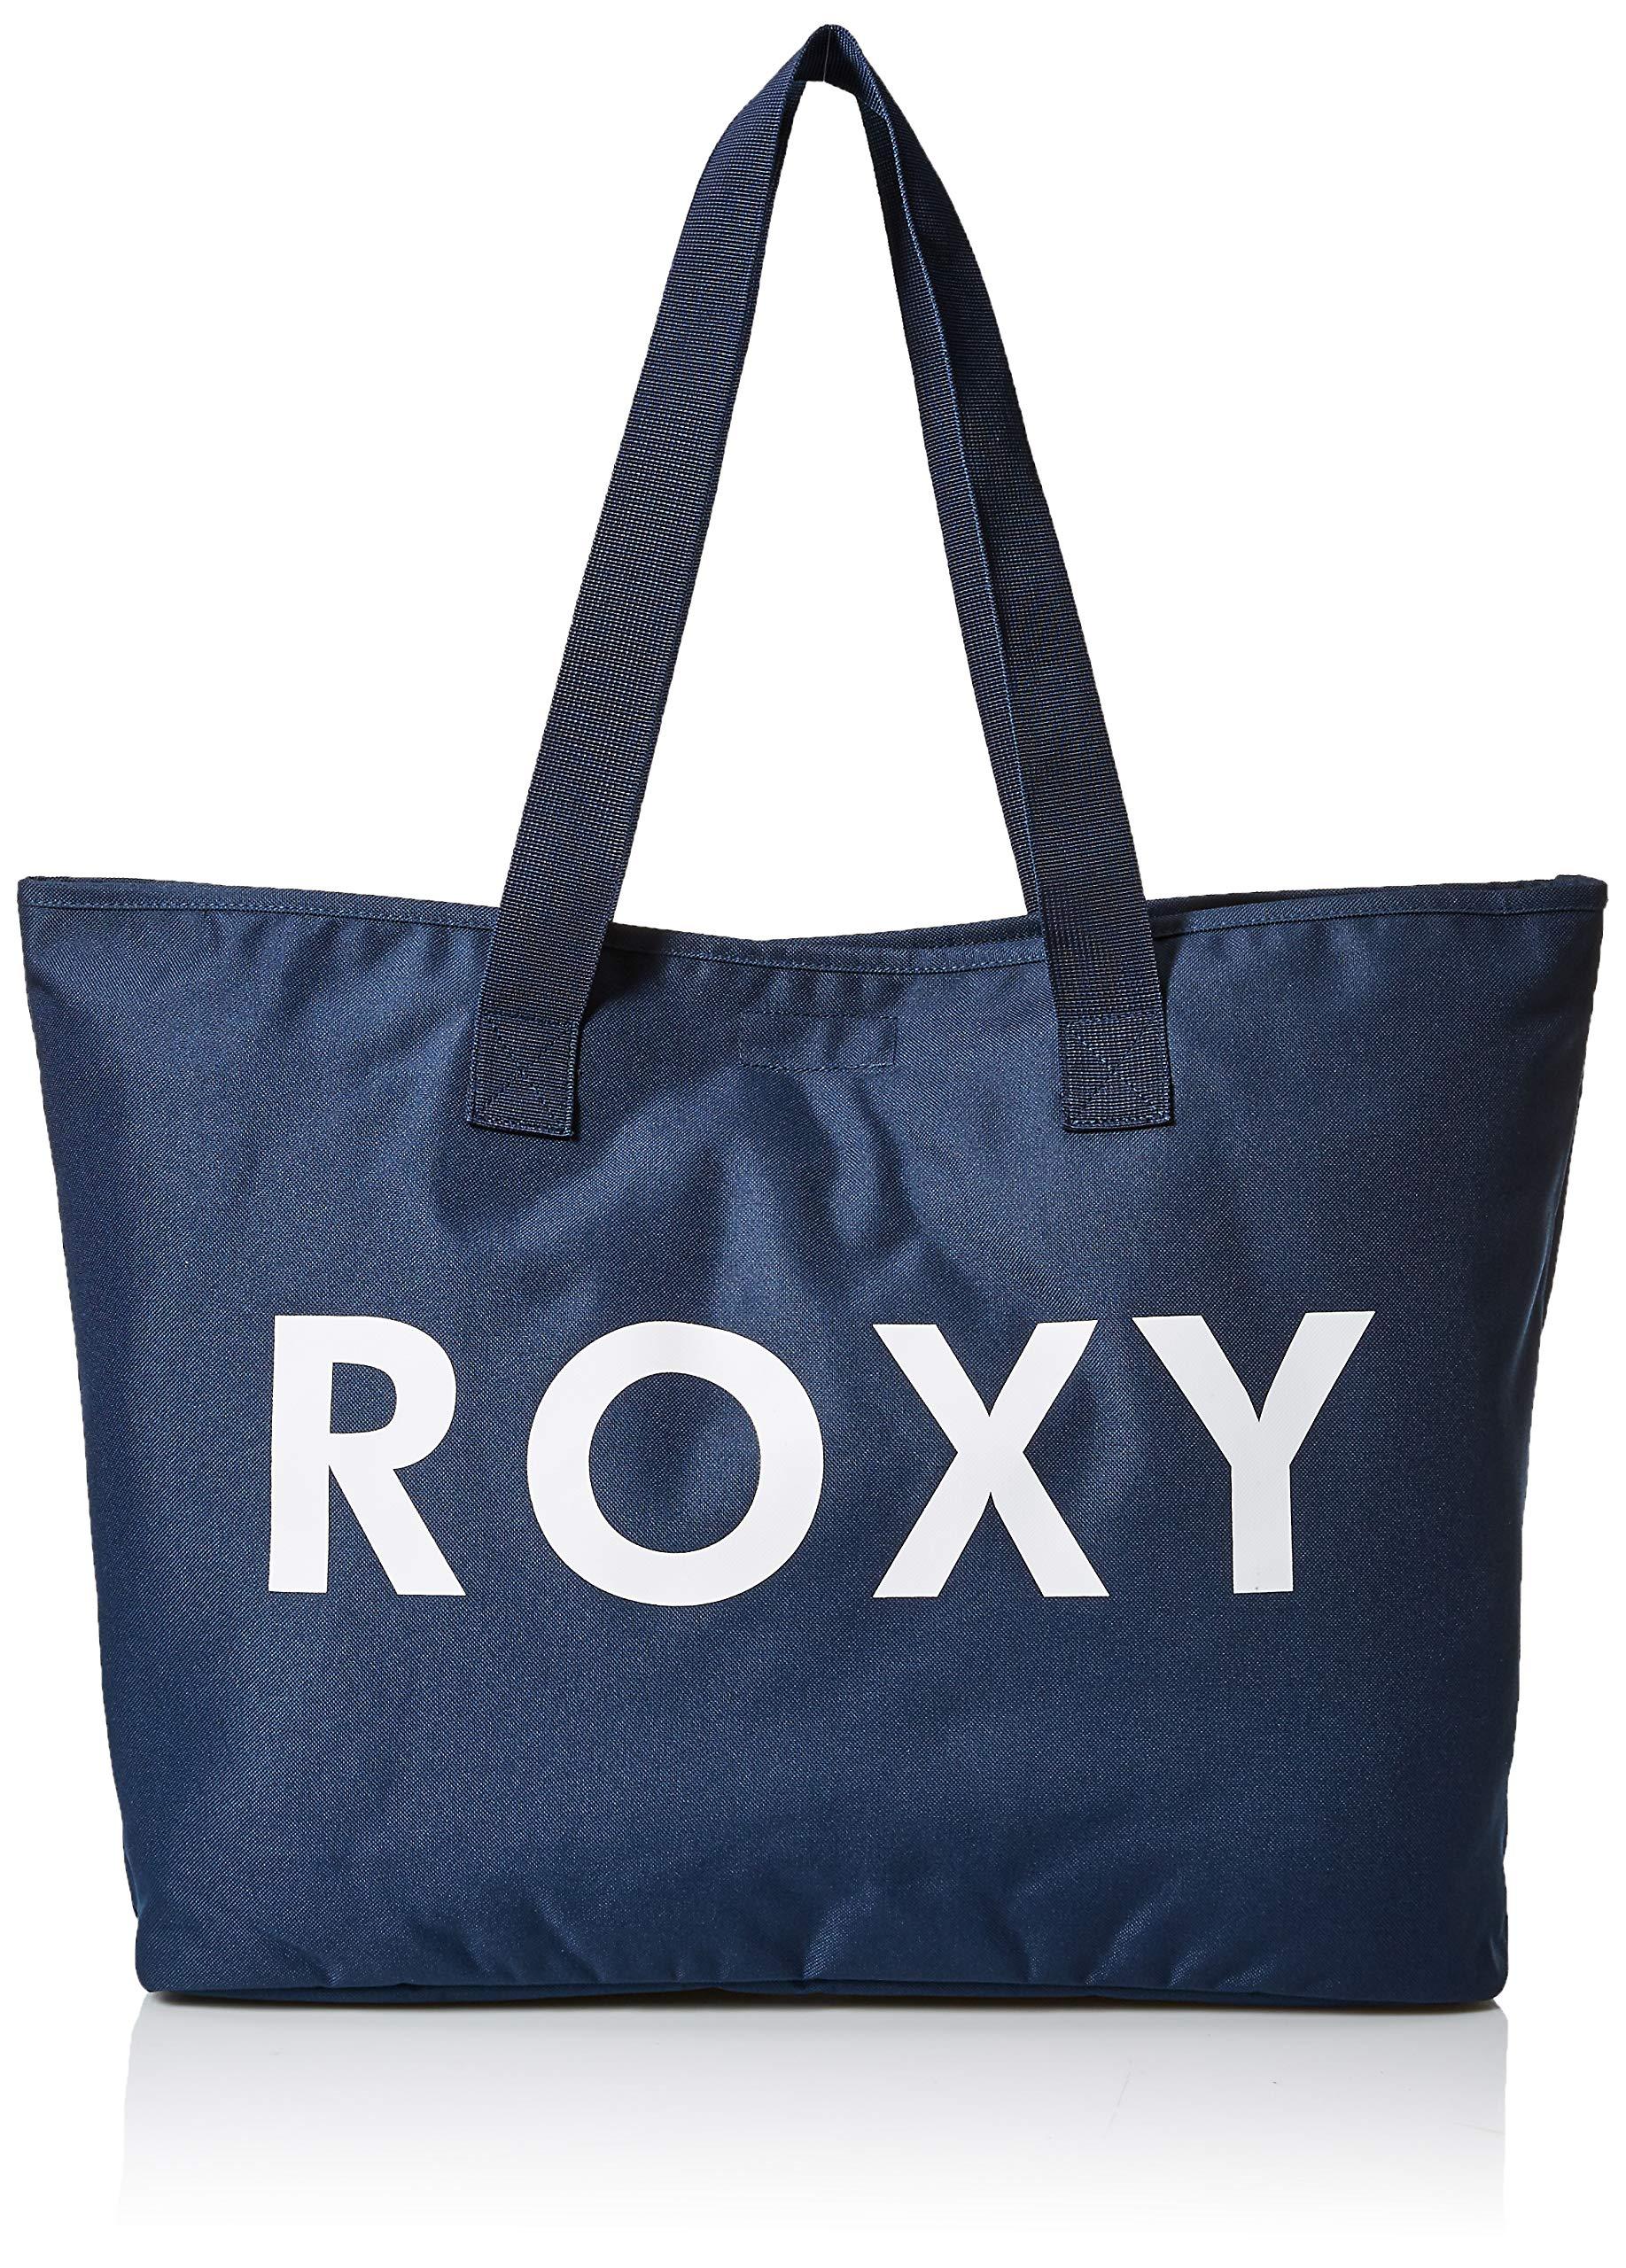 Roxy Wildflower Tote, dress blues